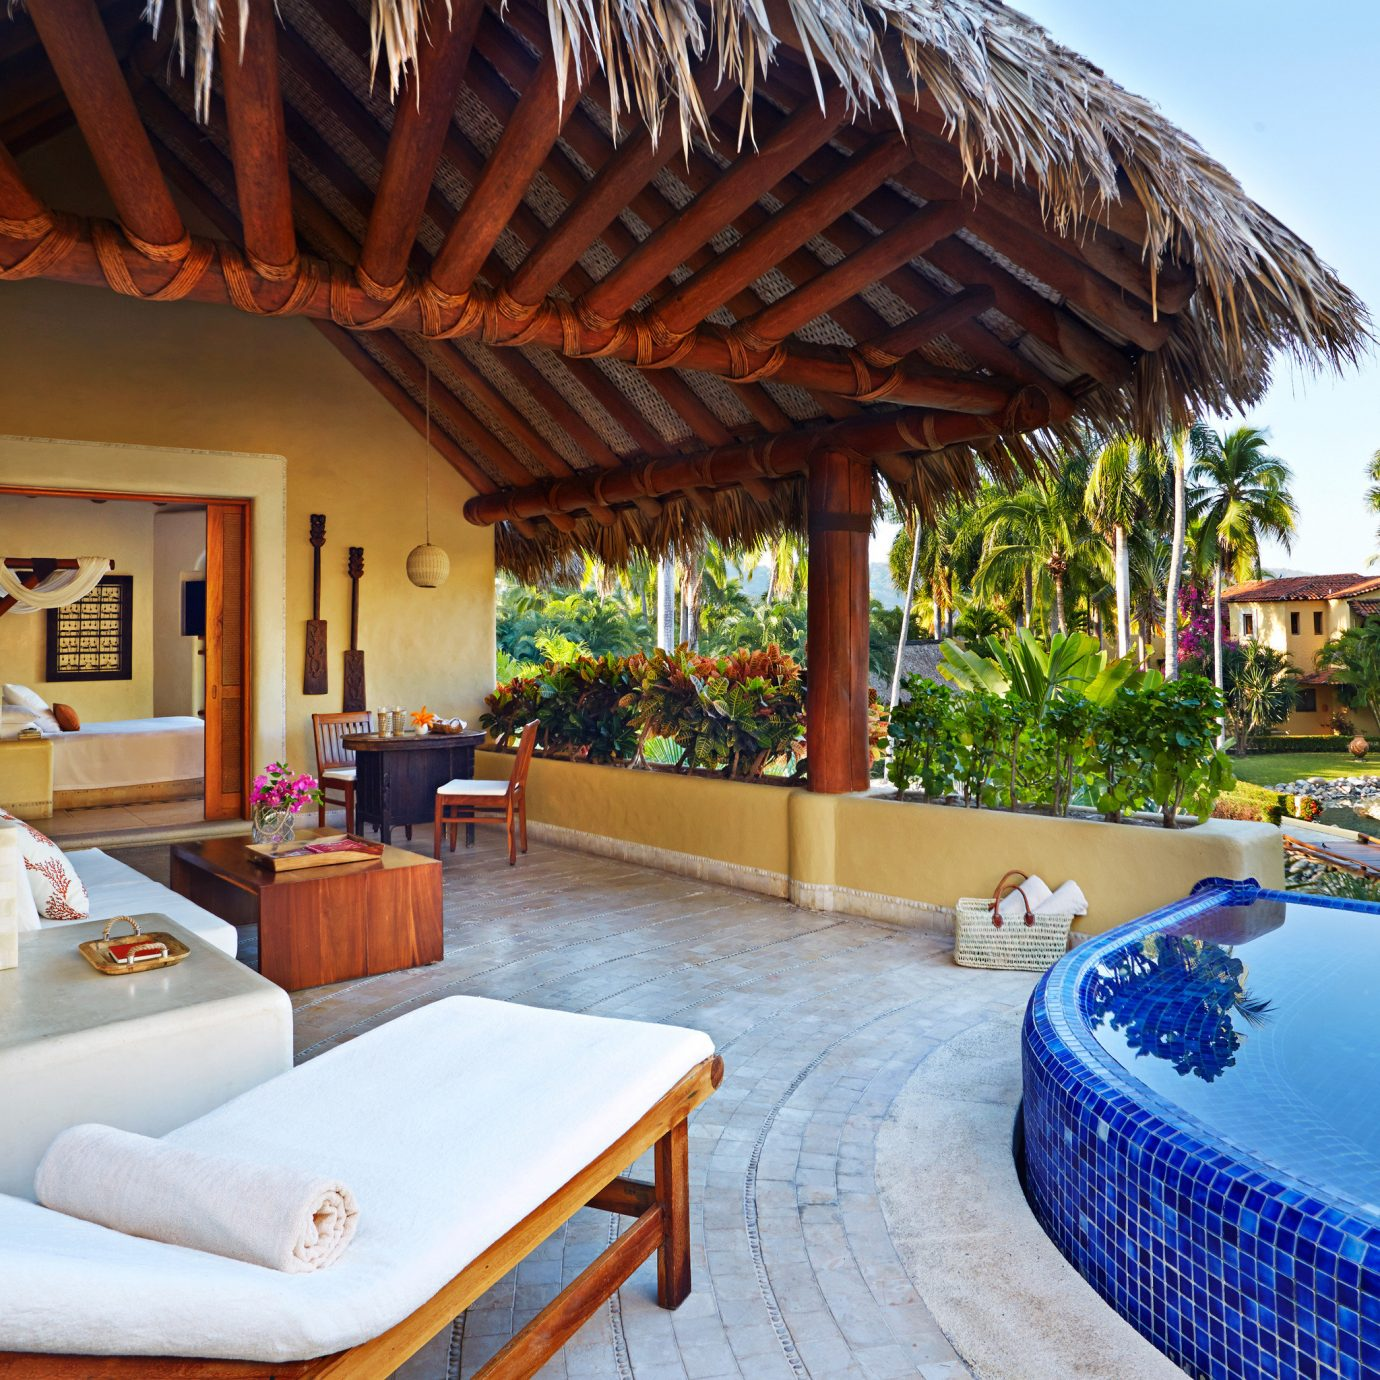 Honeymoon Modern Pool Romance Romantic Rustic Suite Terrace Tropical Waterfront property Resort leisure Villa swimming pool home cottage eco hotel hacienda